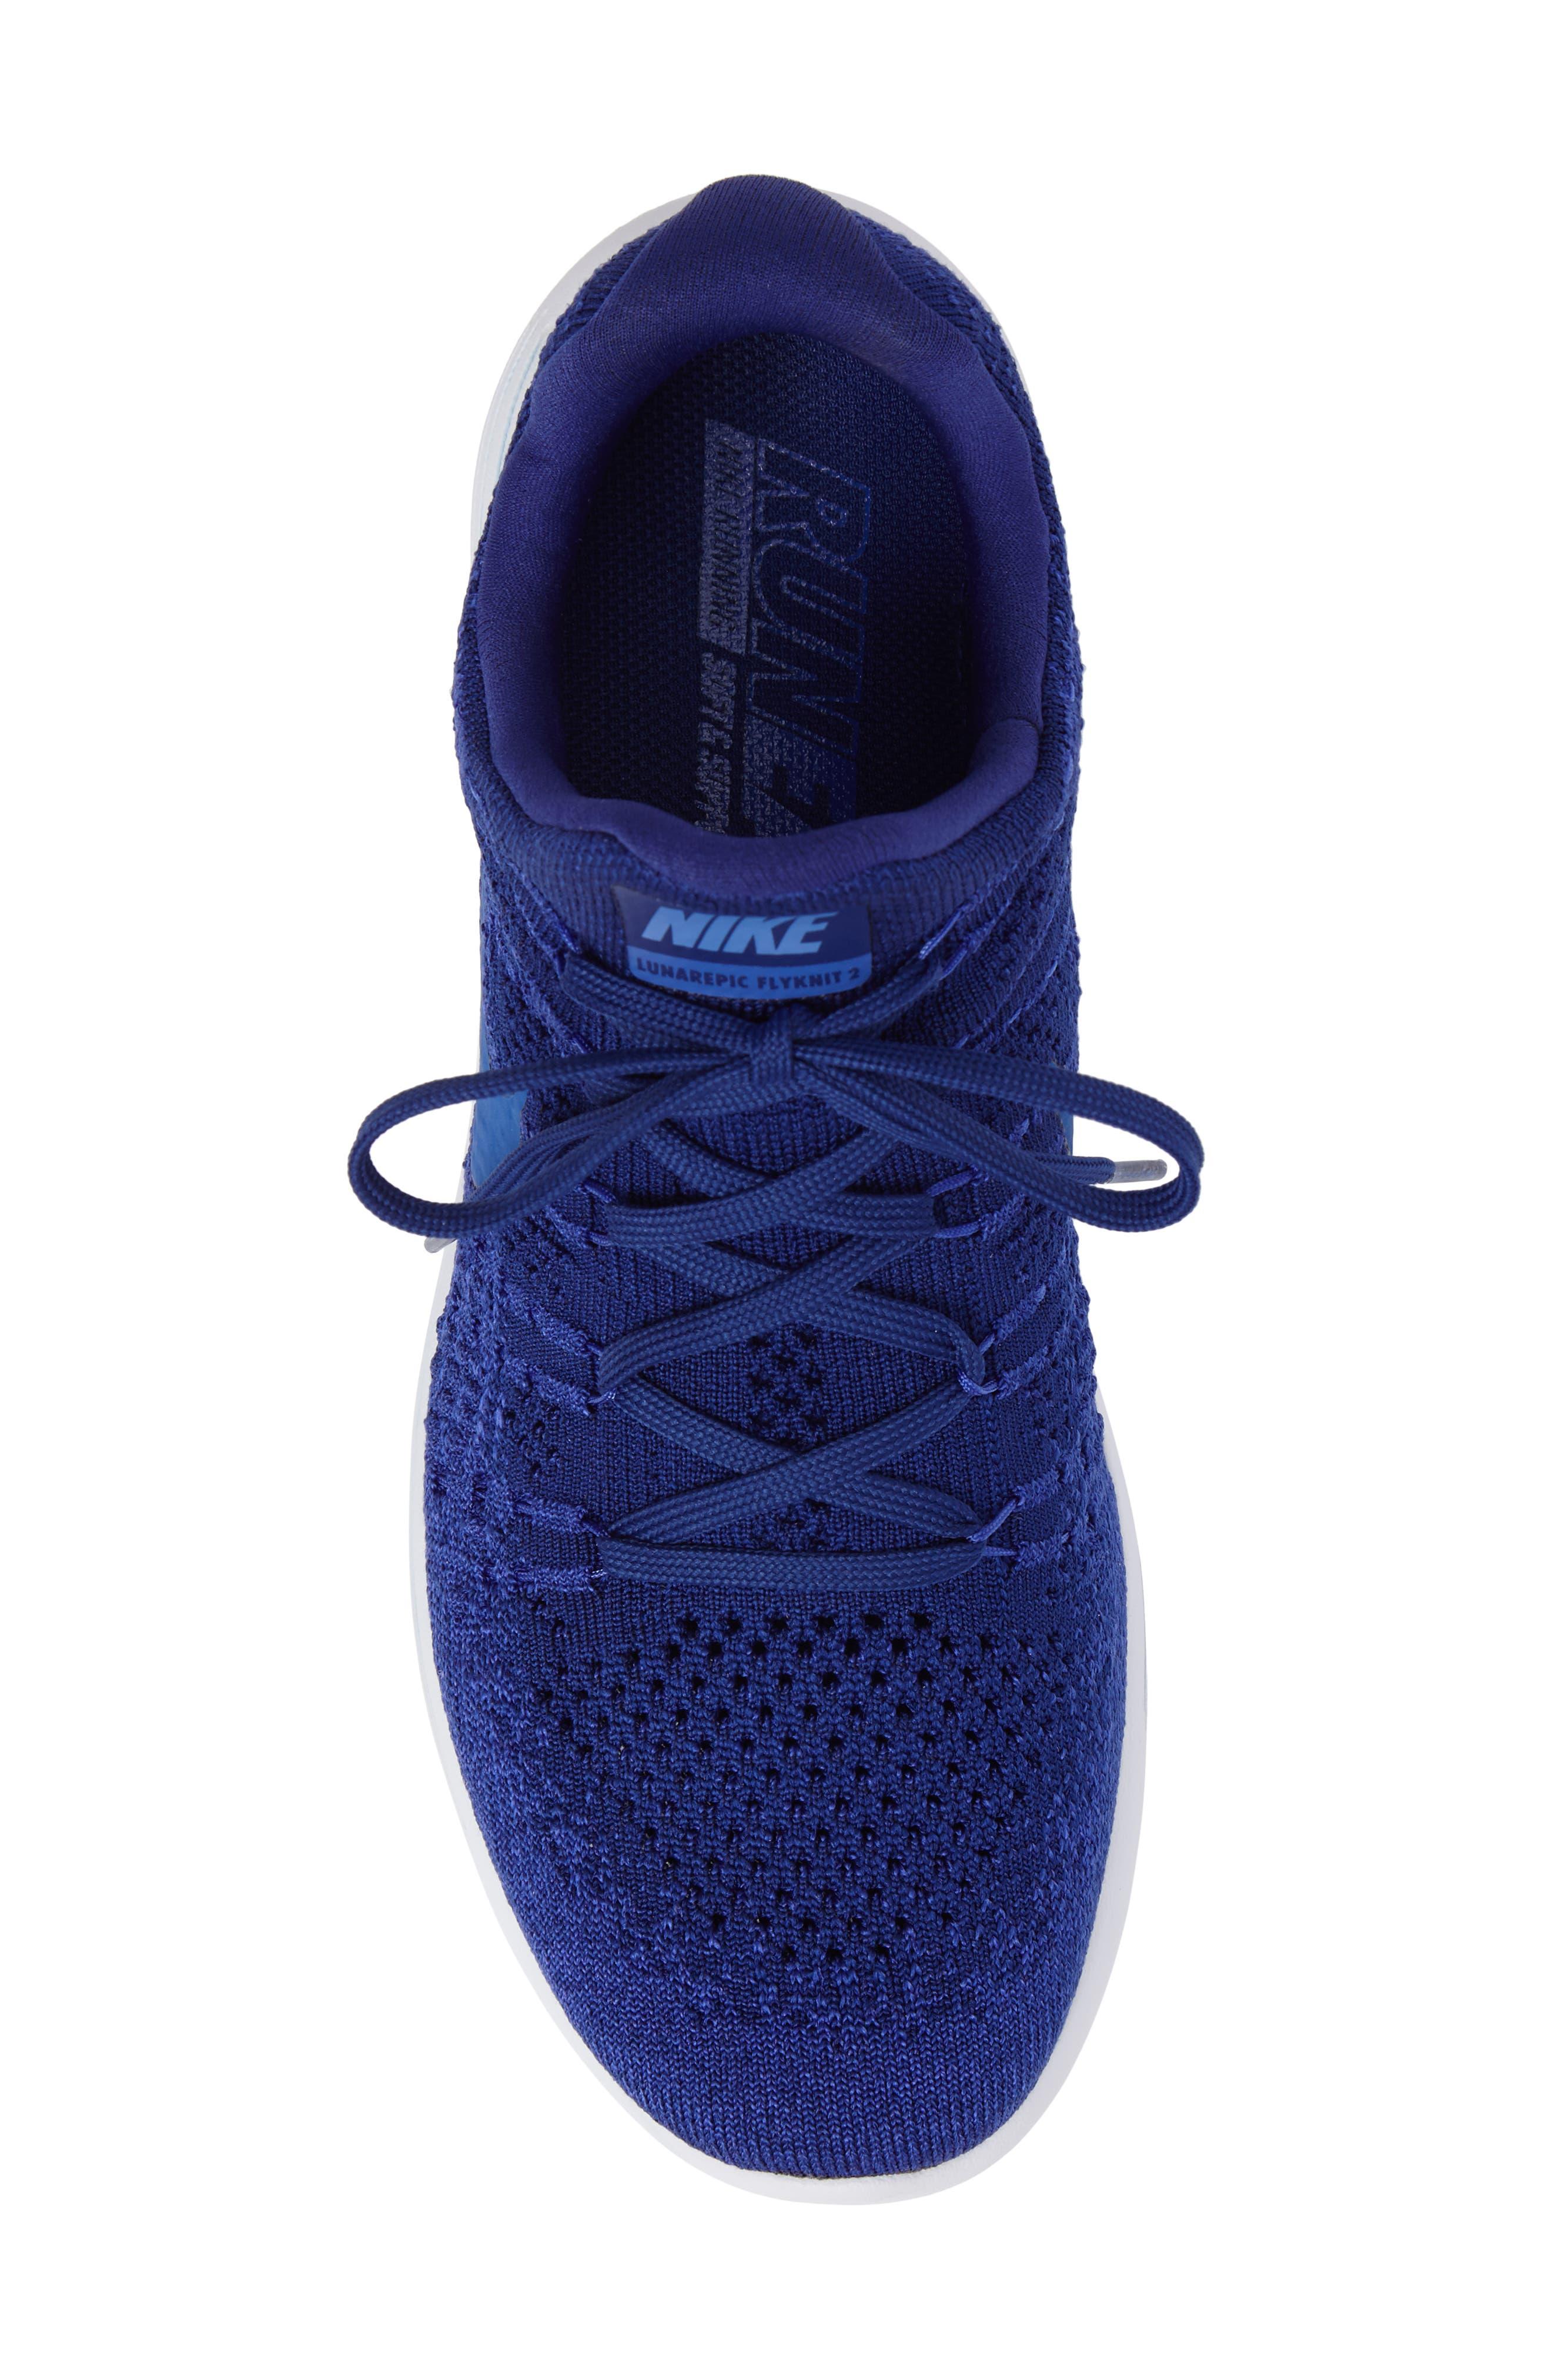 Flyknit 2 LunarEpic Running Shoe,                             Alternate thumbnail 5, color,                             Royal Blue/ Blue